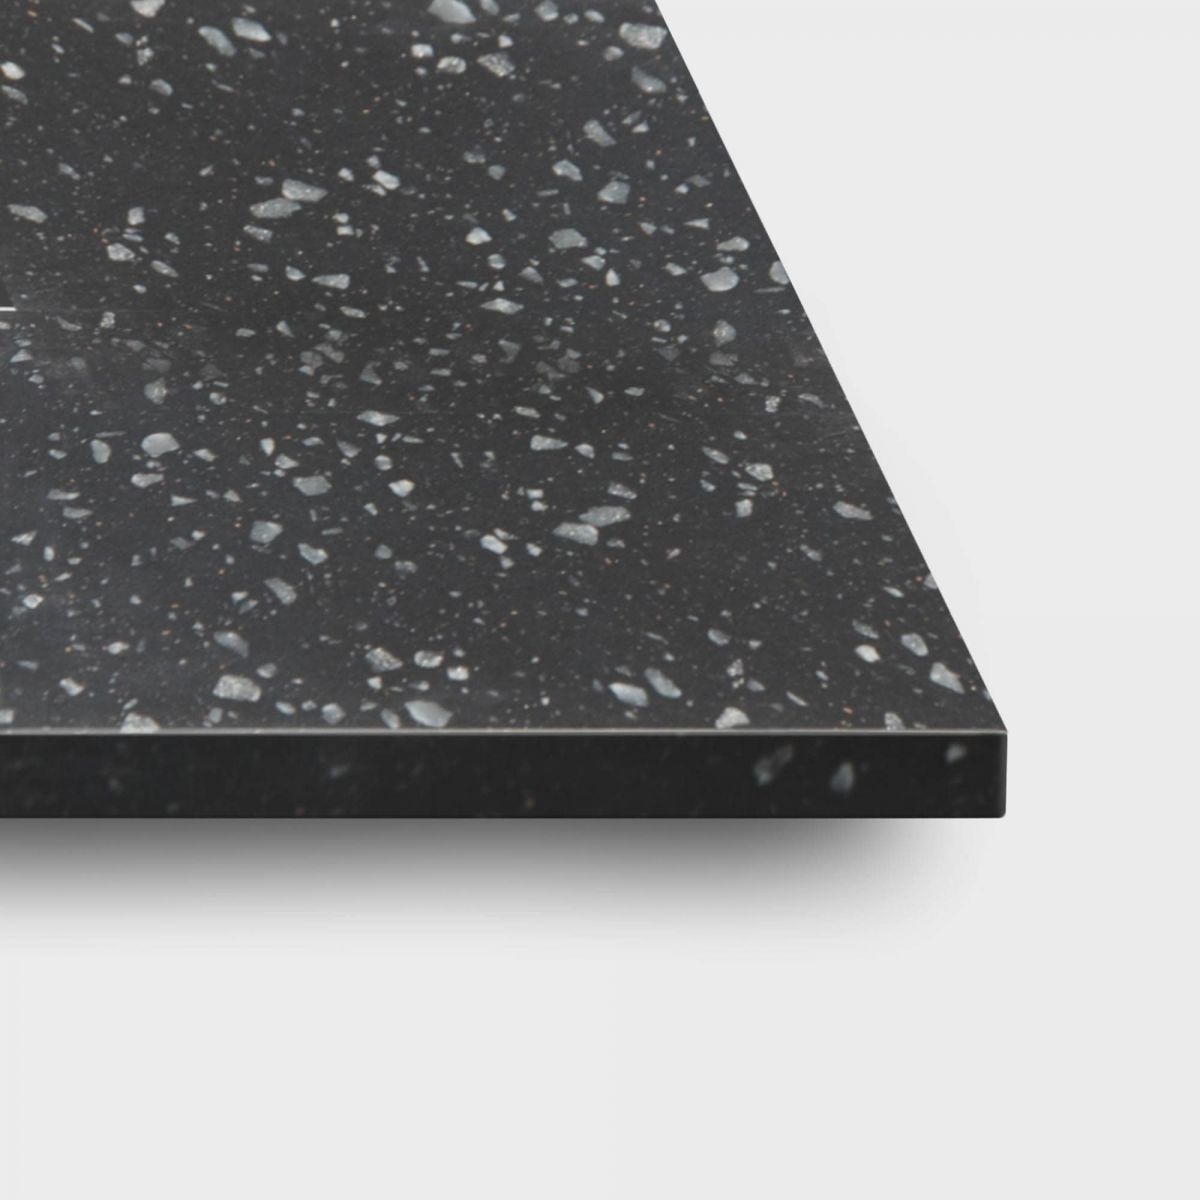 Black Granite - Kordura